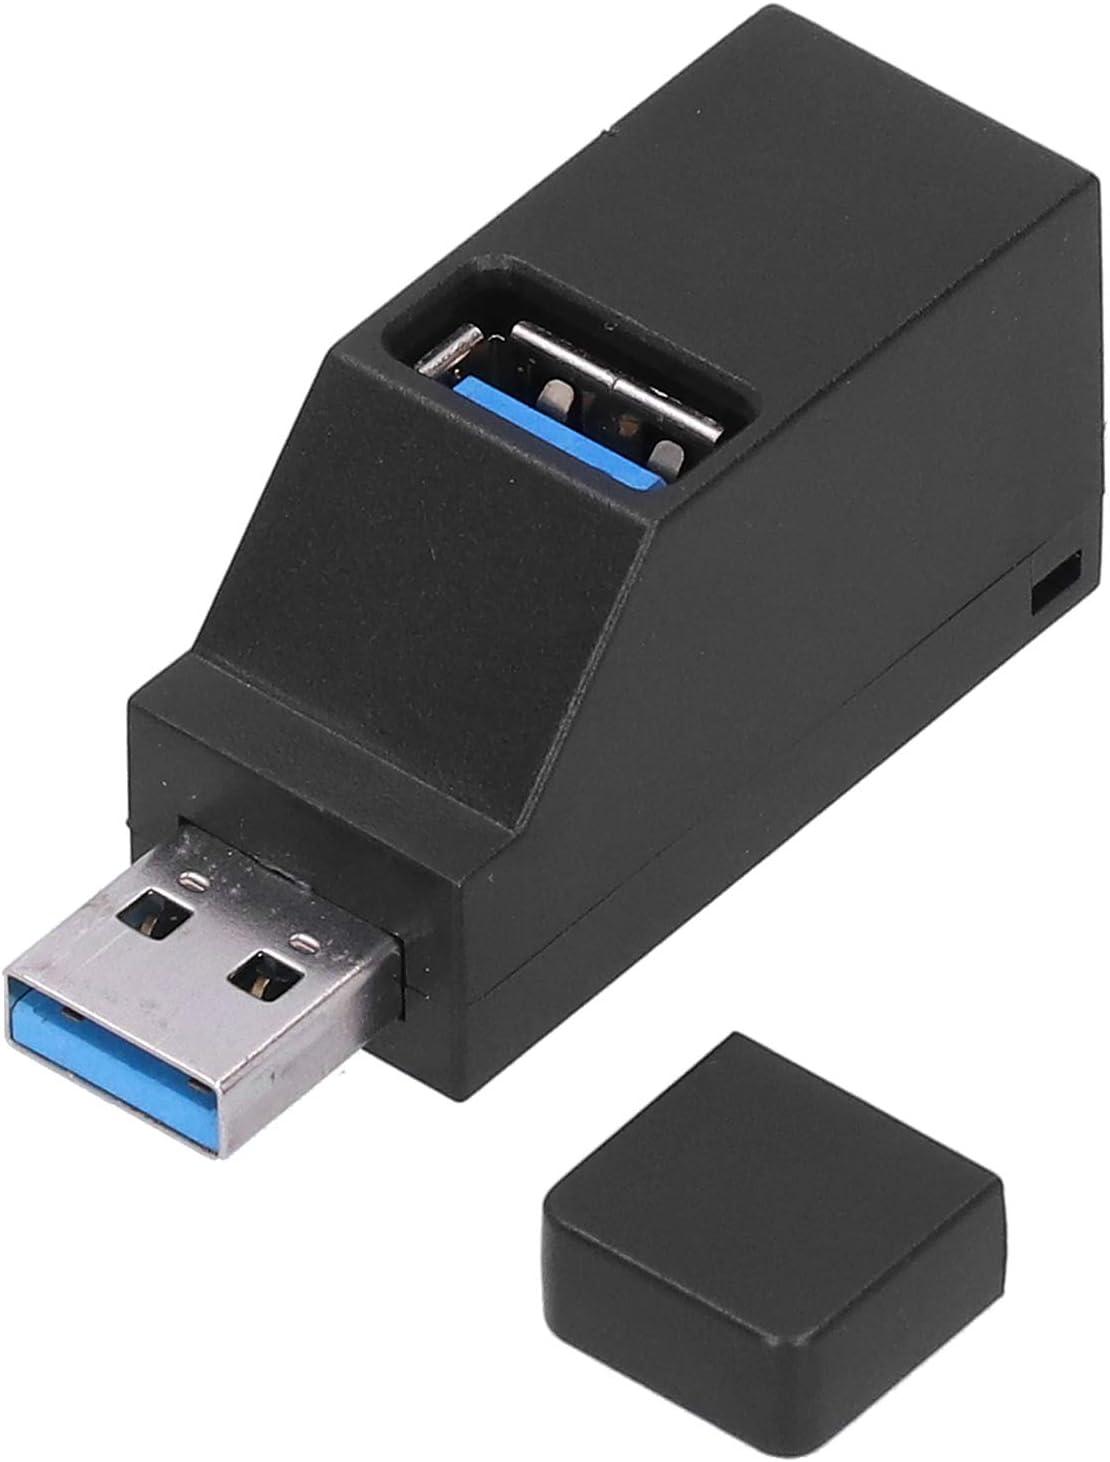 USB Hub Portable USB Hub 3 Port USB Hub with Comprehensive Compatibility USB2.0 USB3.0 Interface